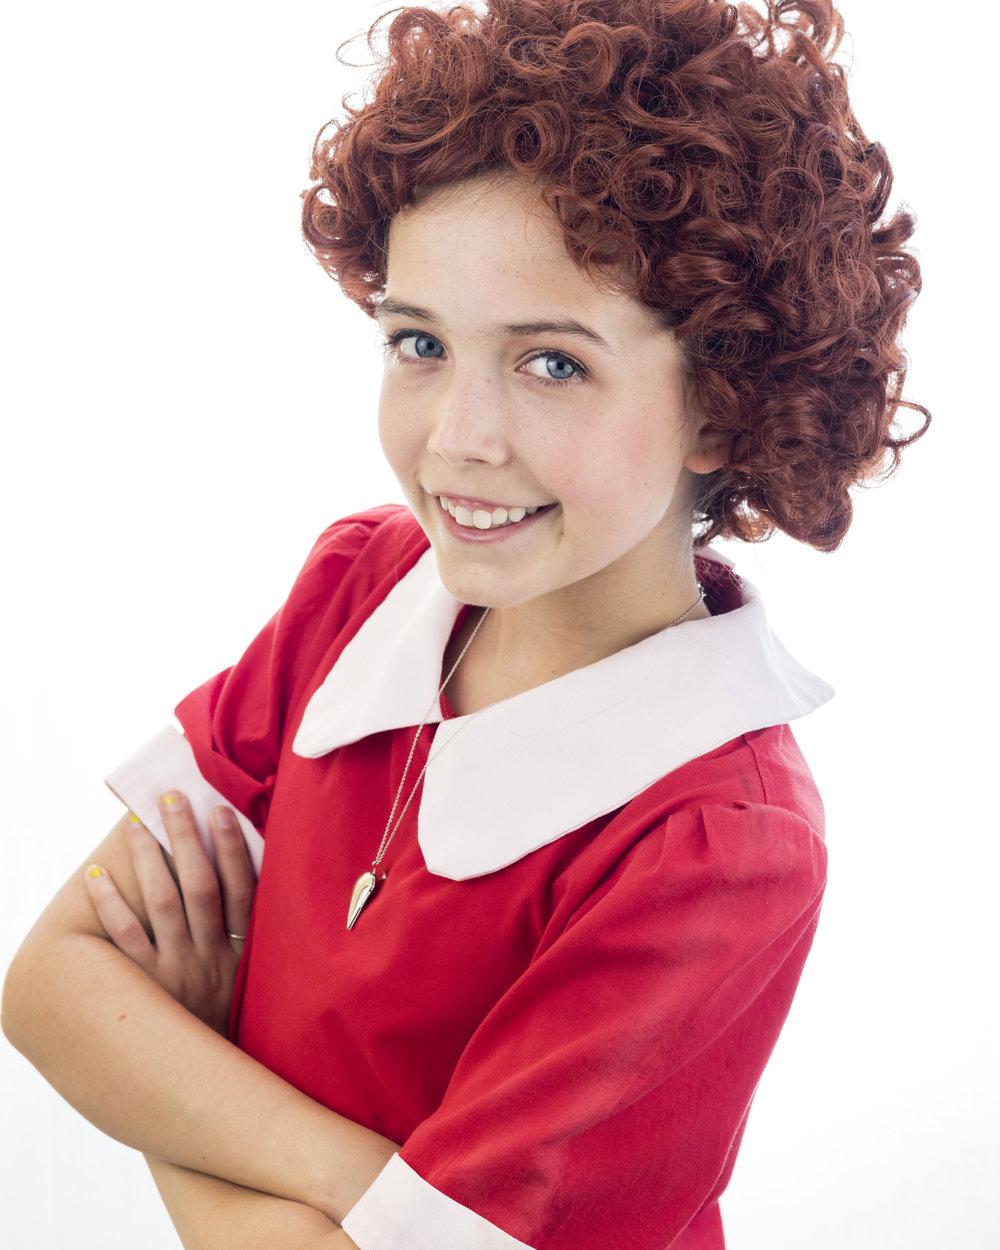 Annie-Headshot-9795.jpg